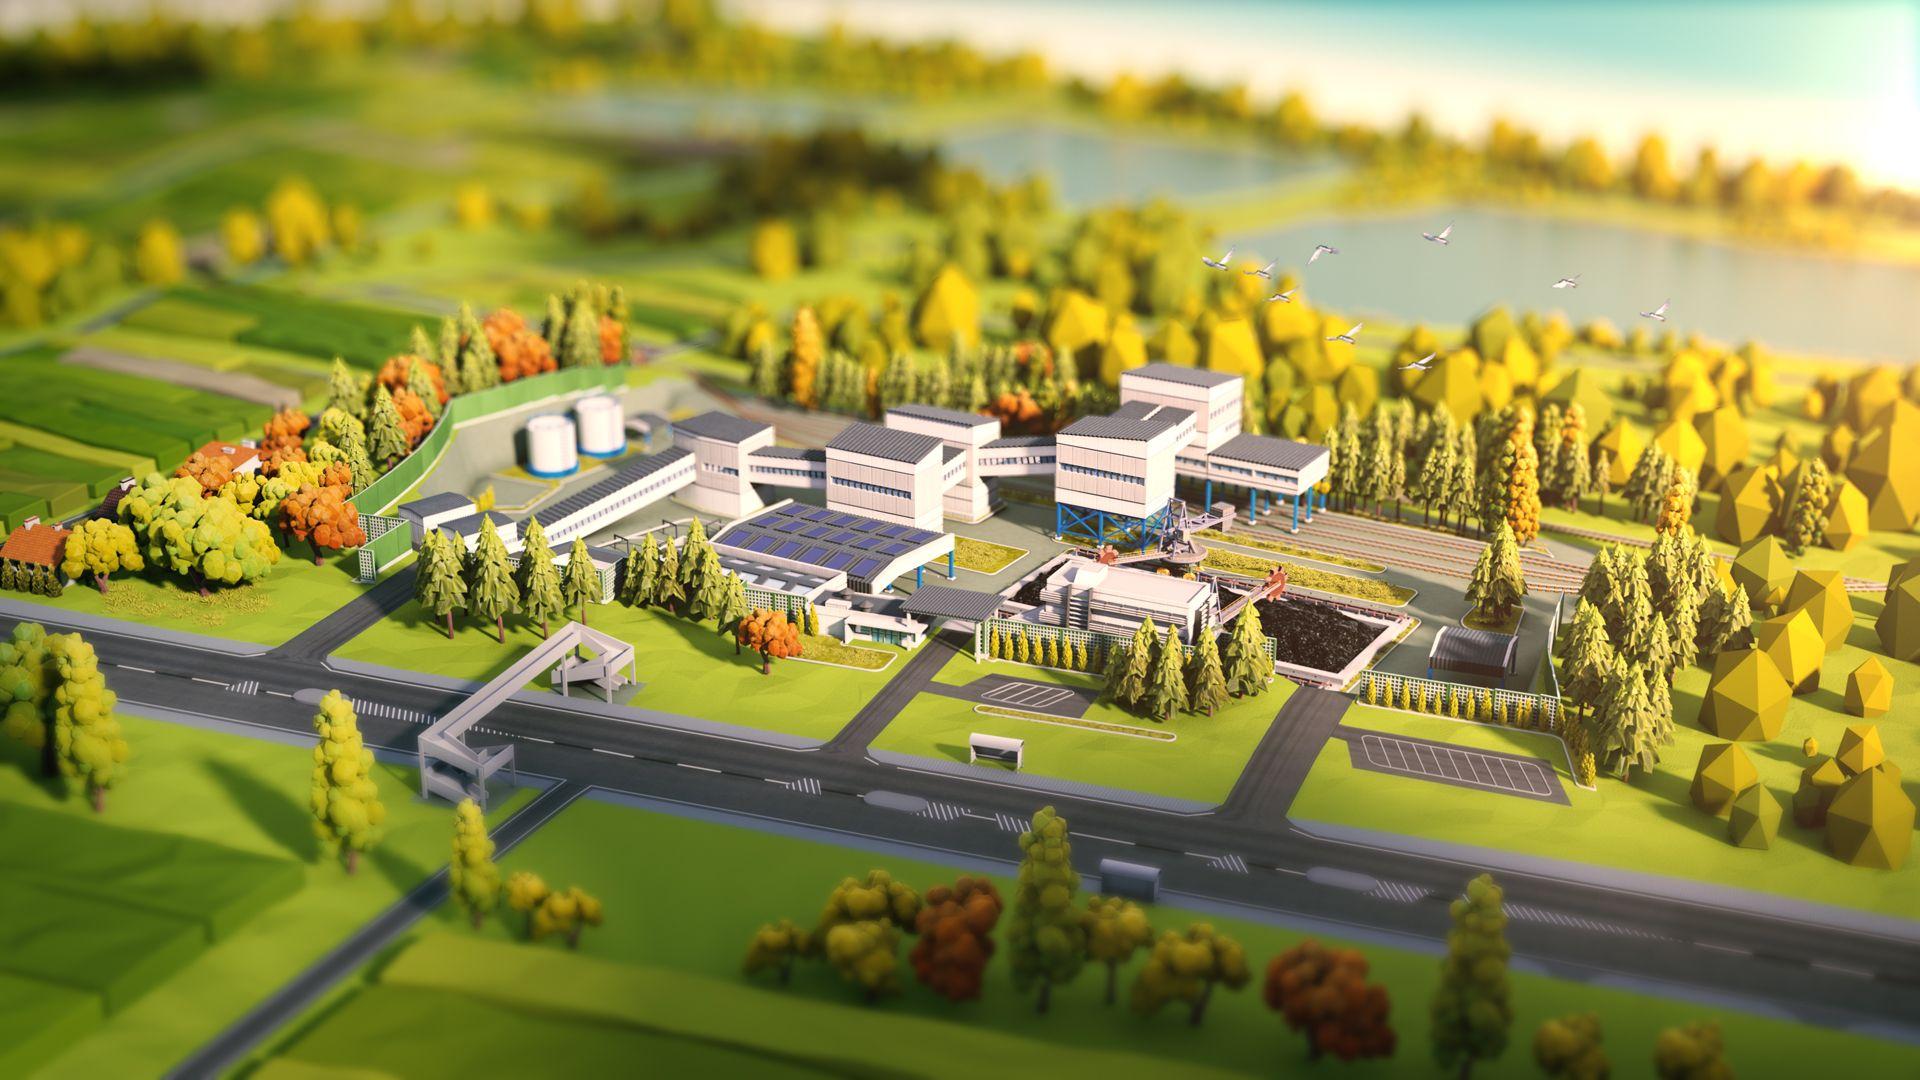 KOPEX coal mine animation Landscape scenery, Low poly